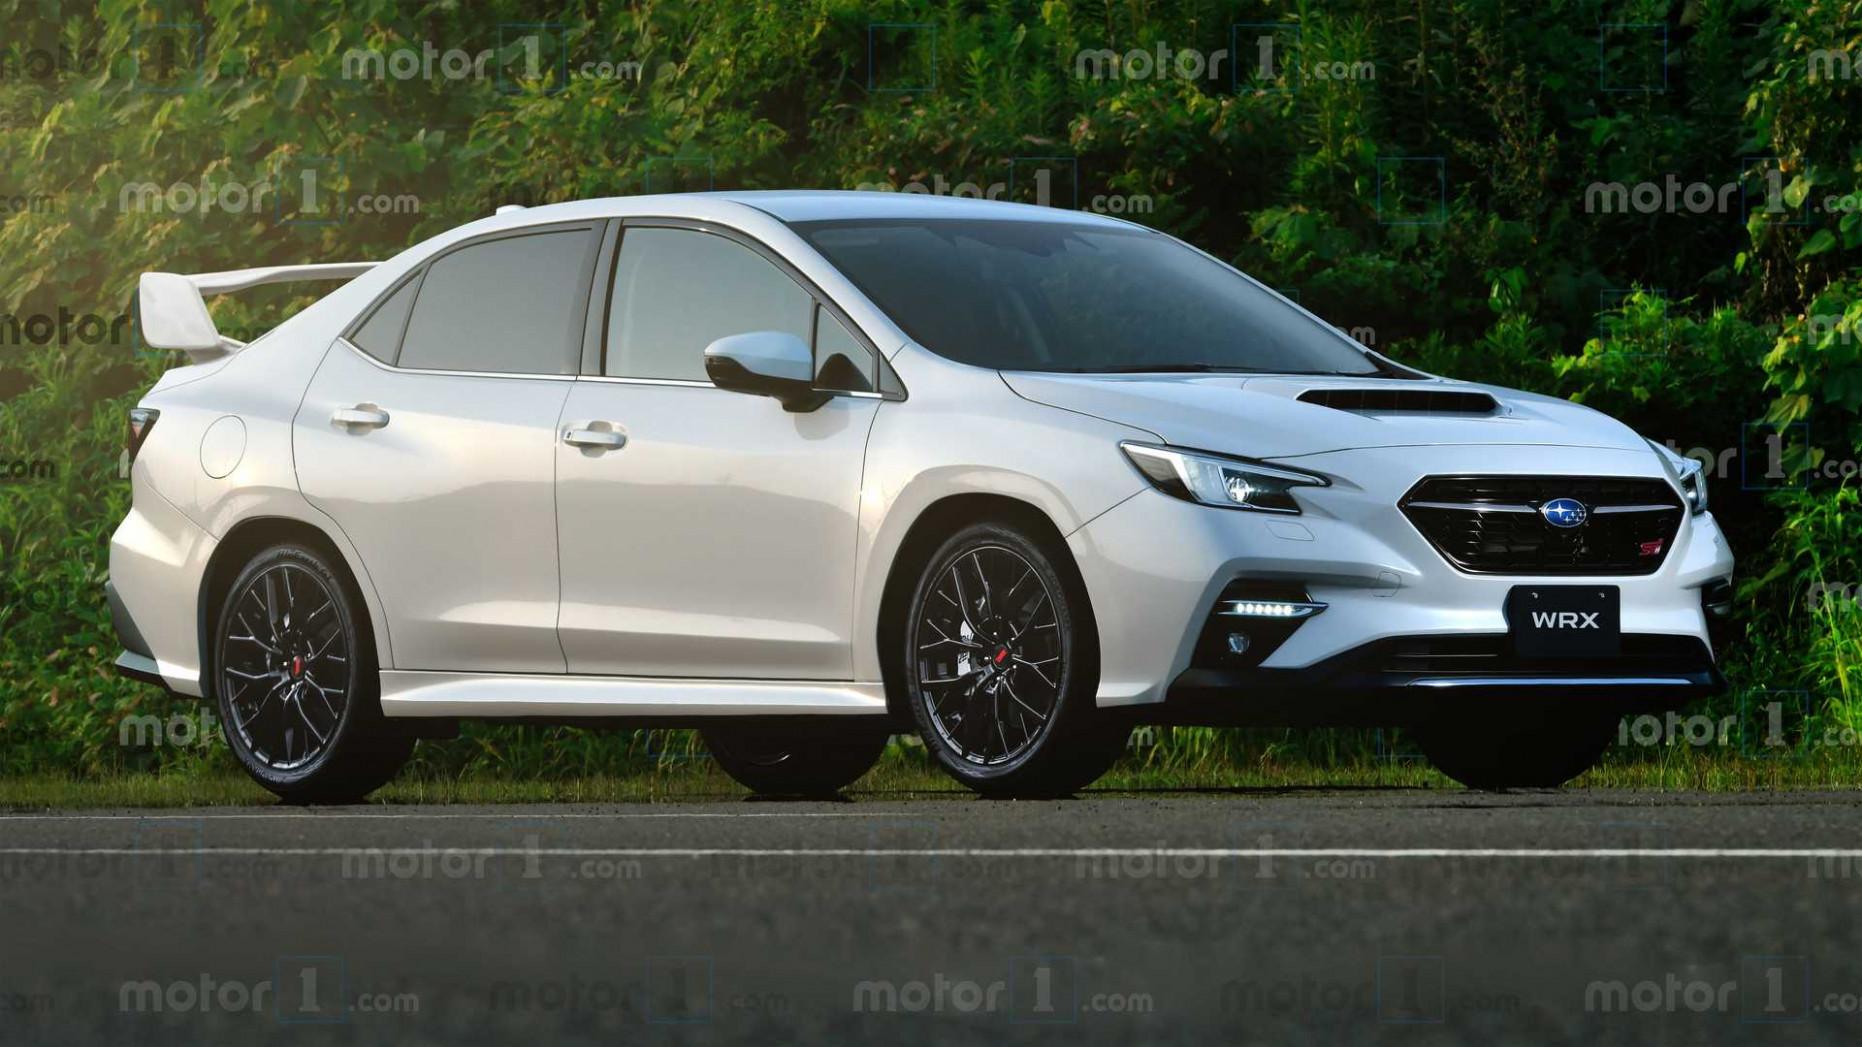 Concept Subaru Wrx 2022 Redesign